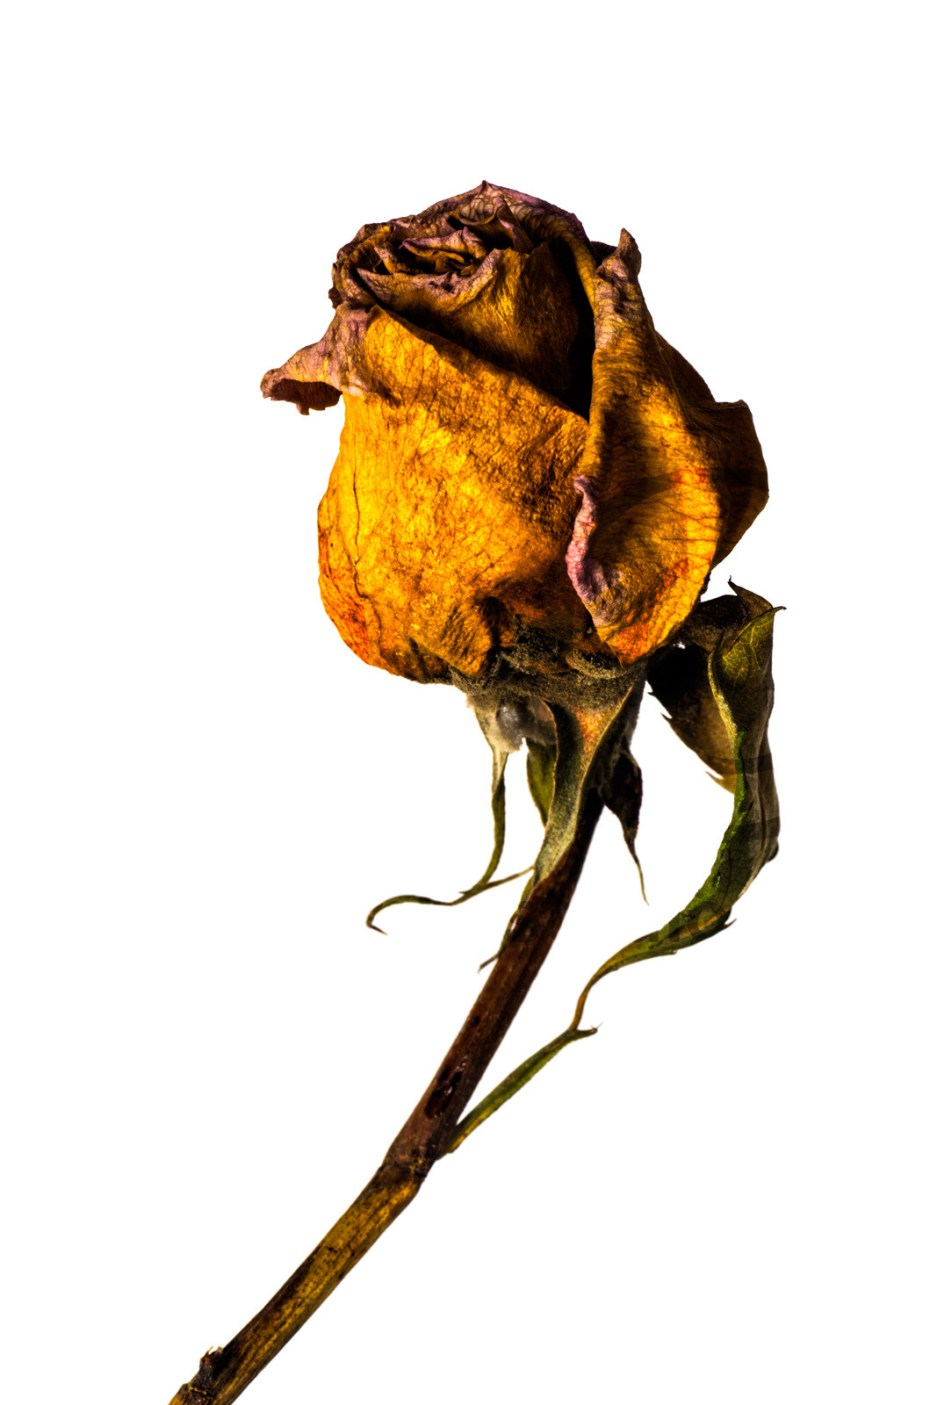 20150906_1743-yellow-rose